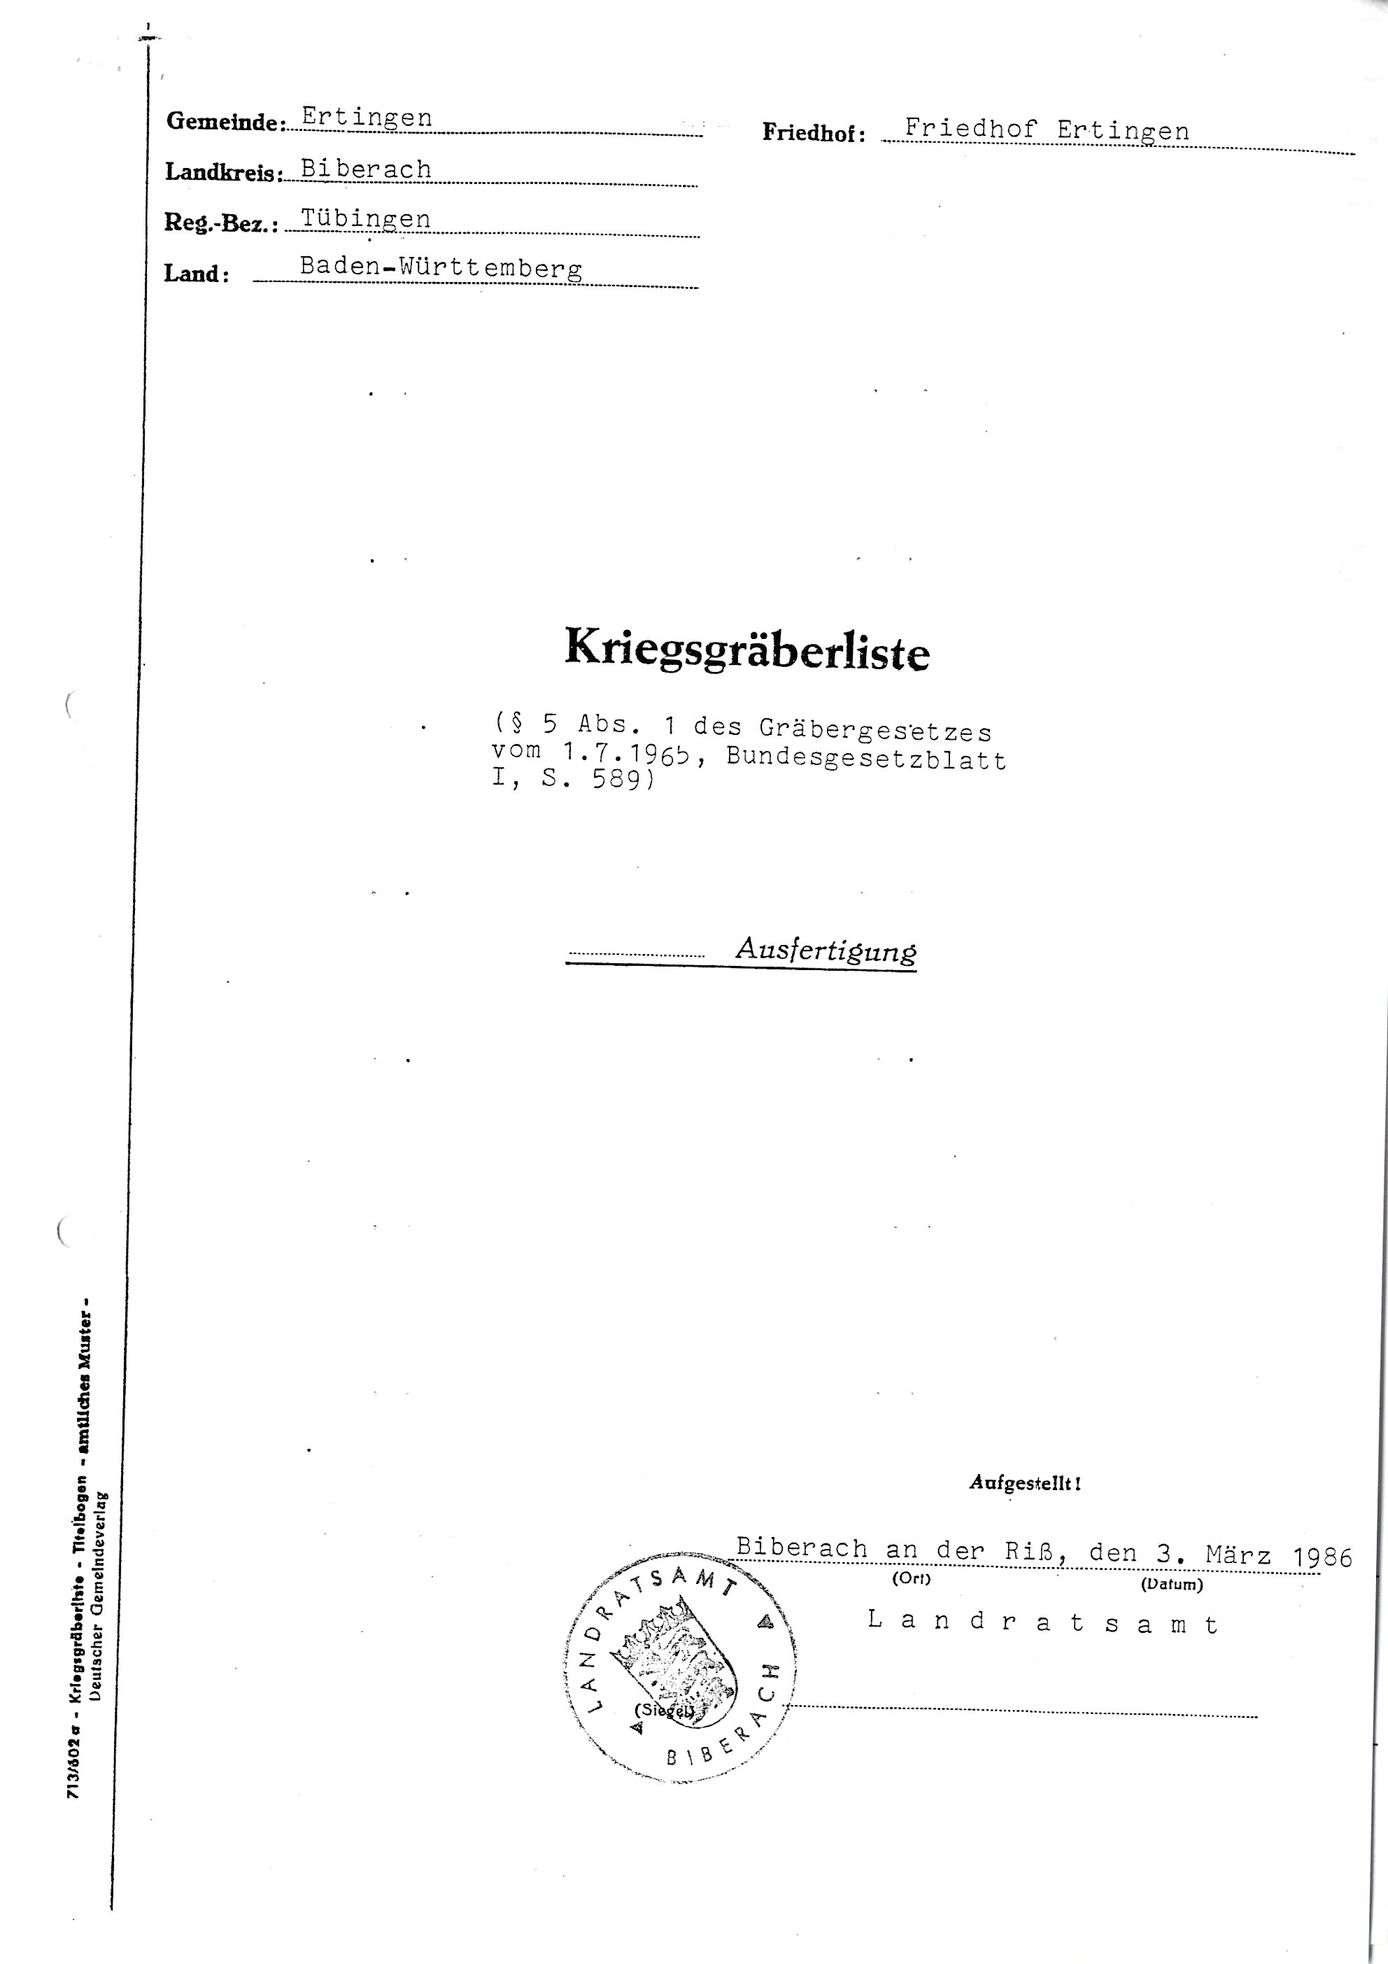 Ertingen, Bild 1